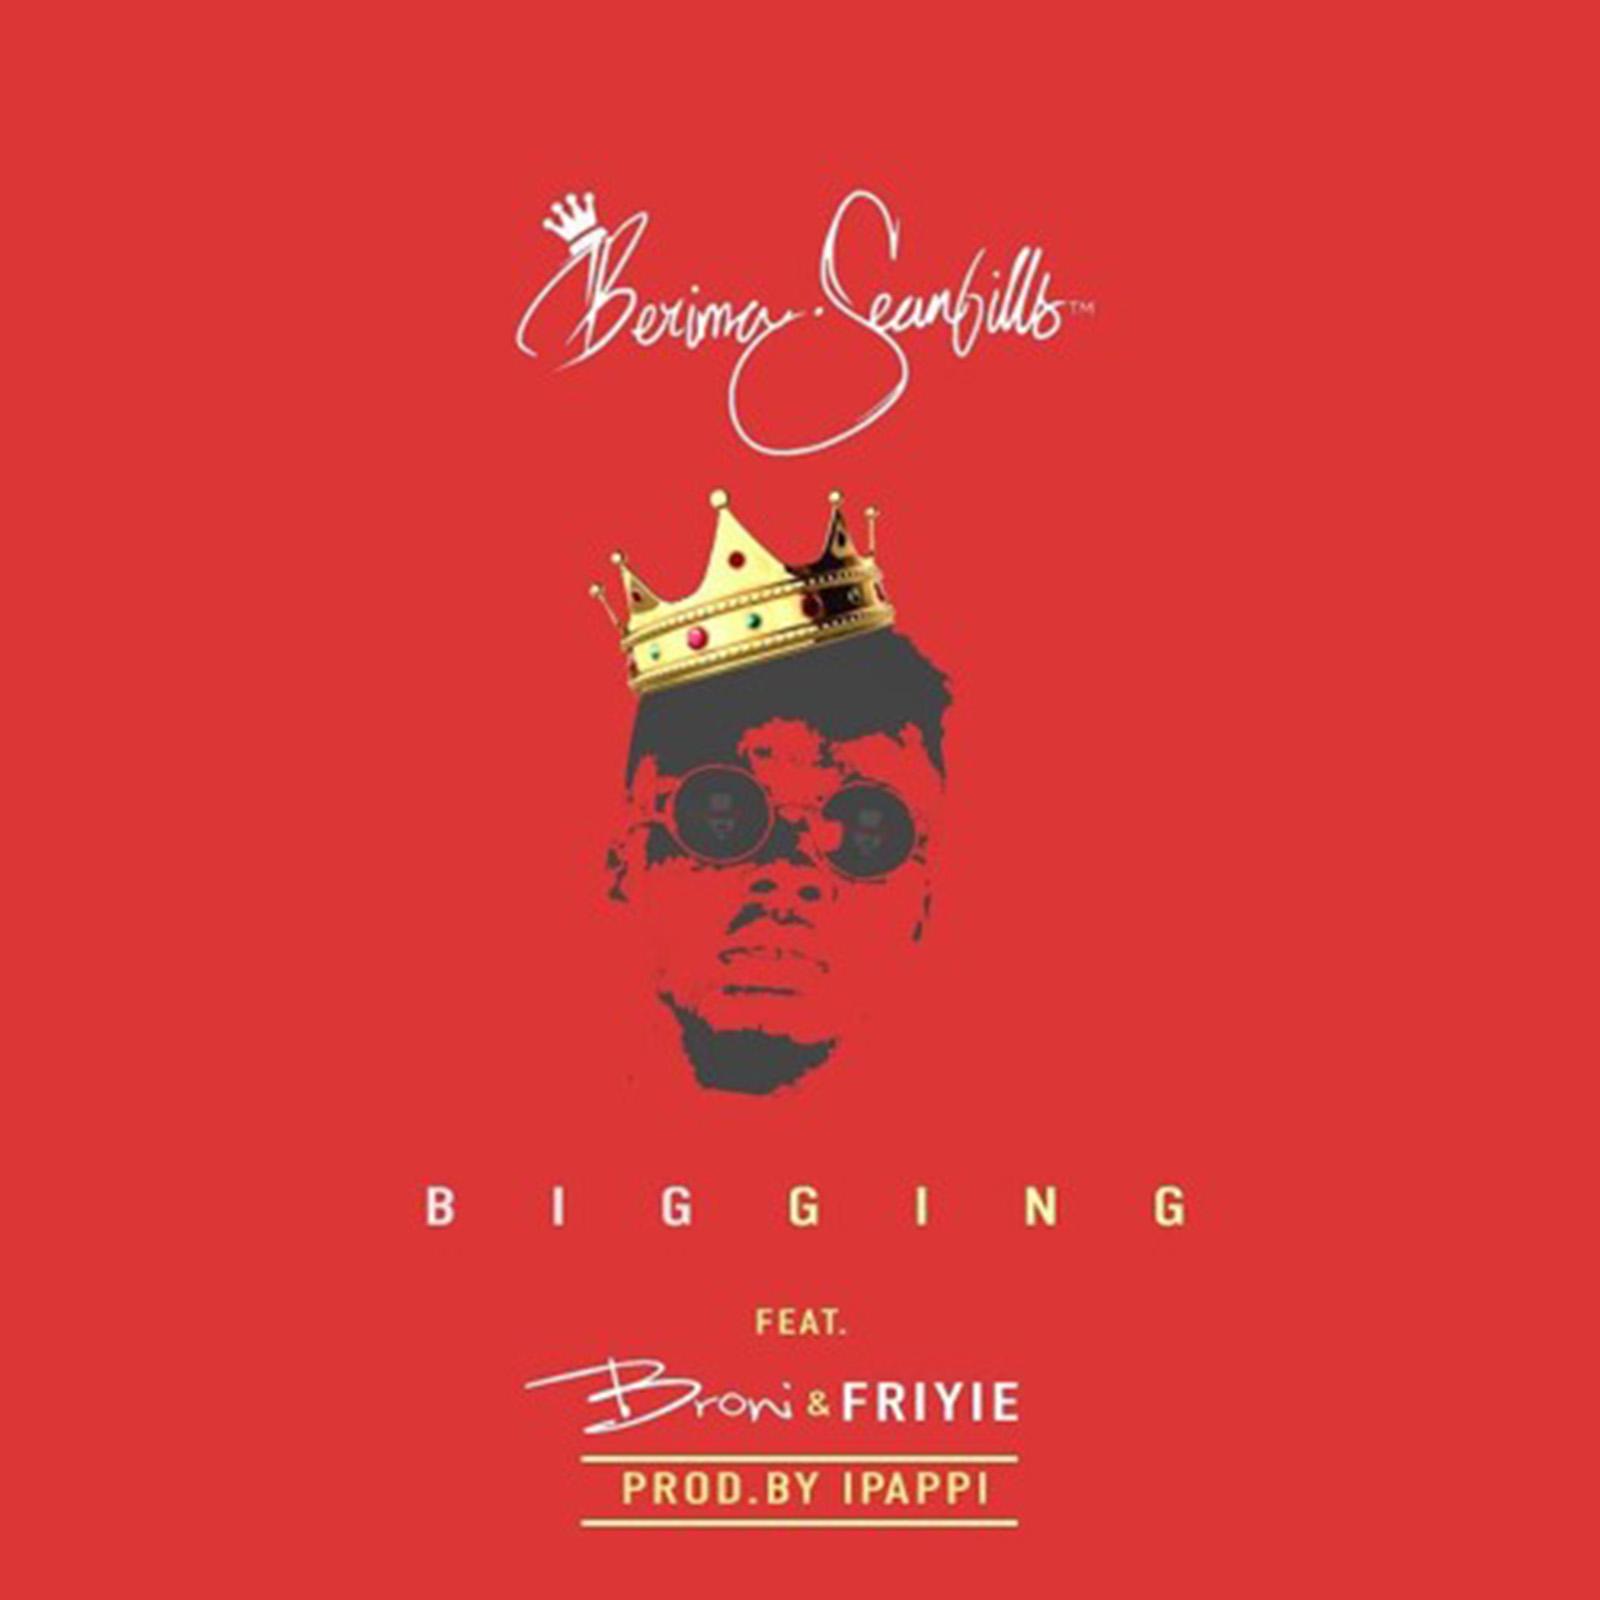 Bigging by Berima SeanBills feat. Broni & Friyie